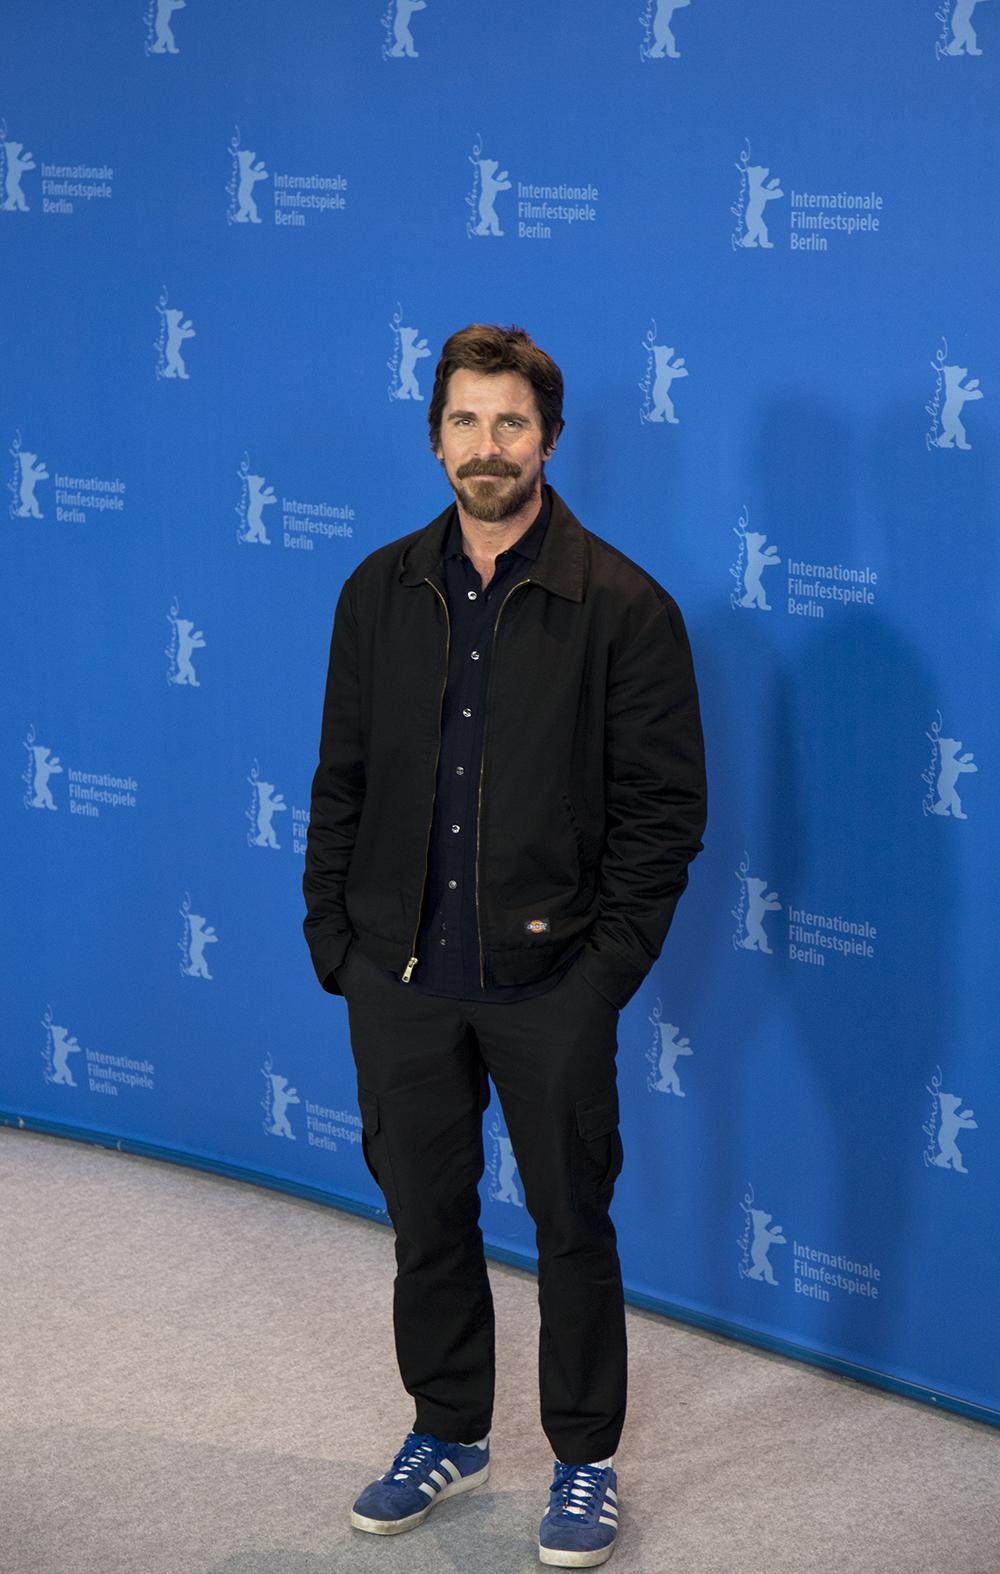 Christian Bale / foto_Senka Ćatić / Spektroom / FBL